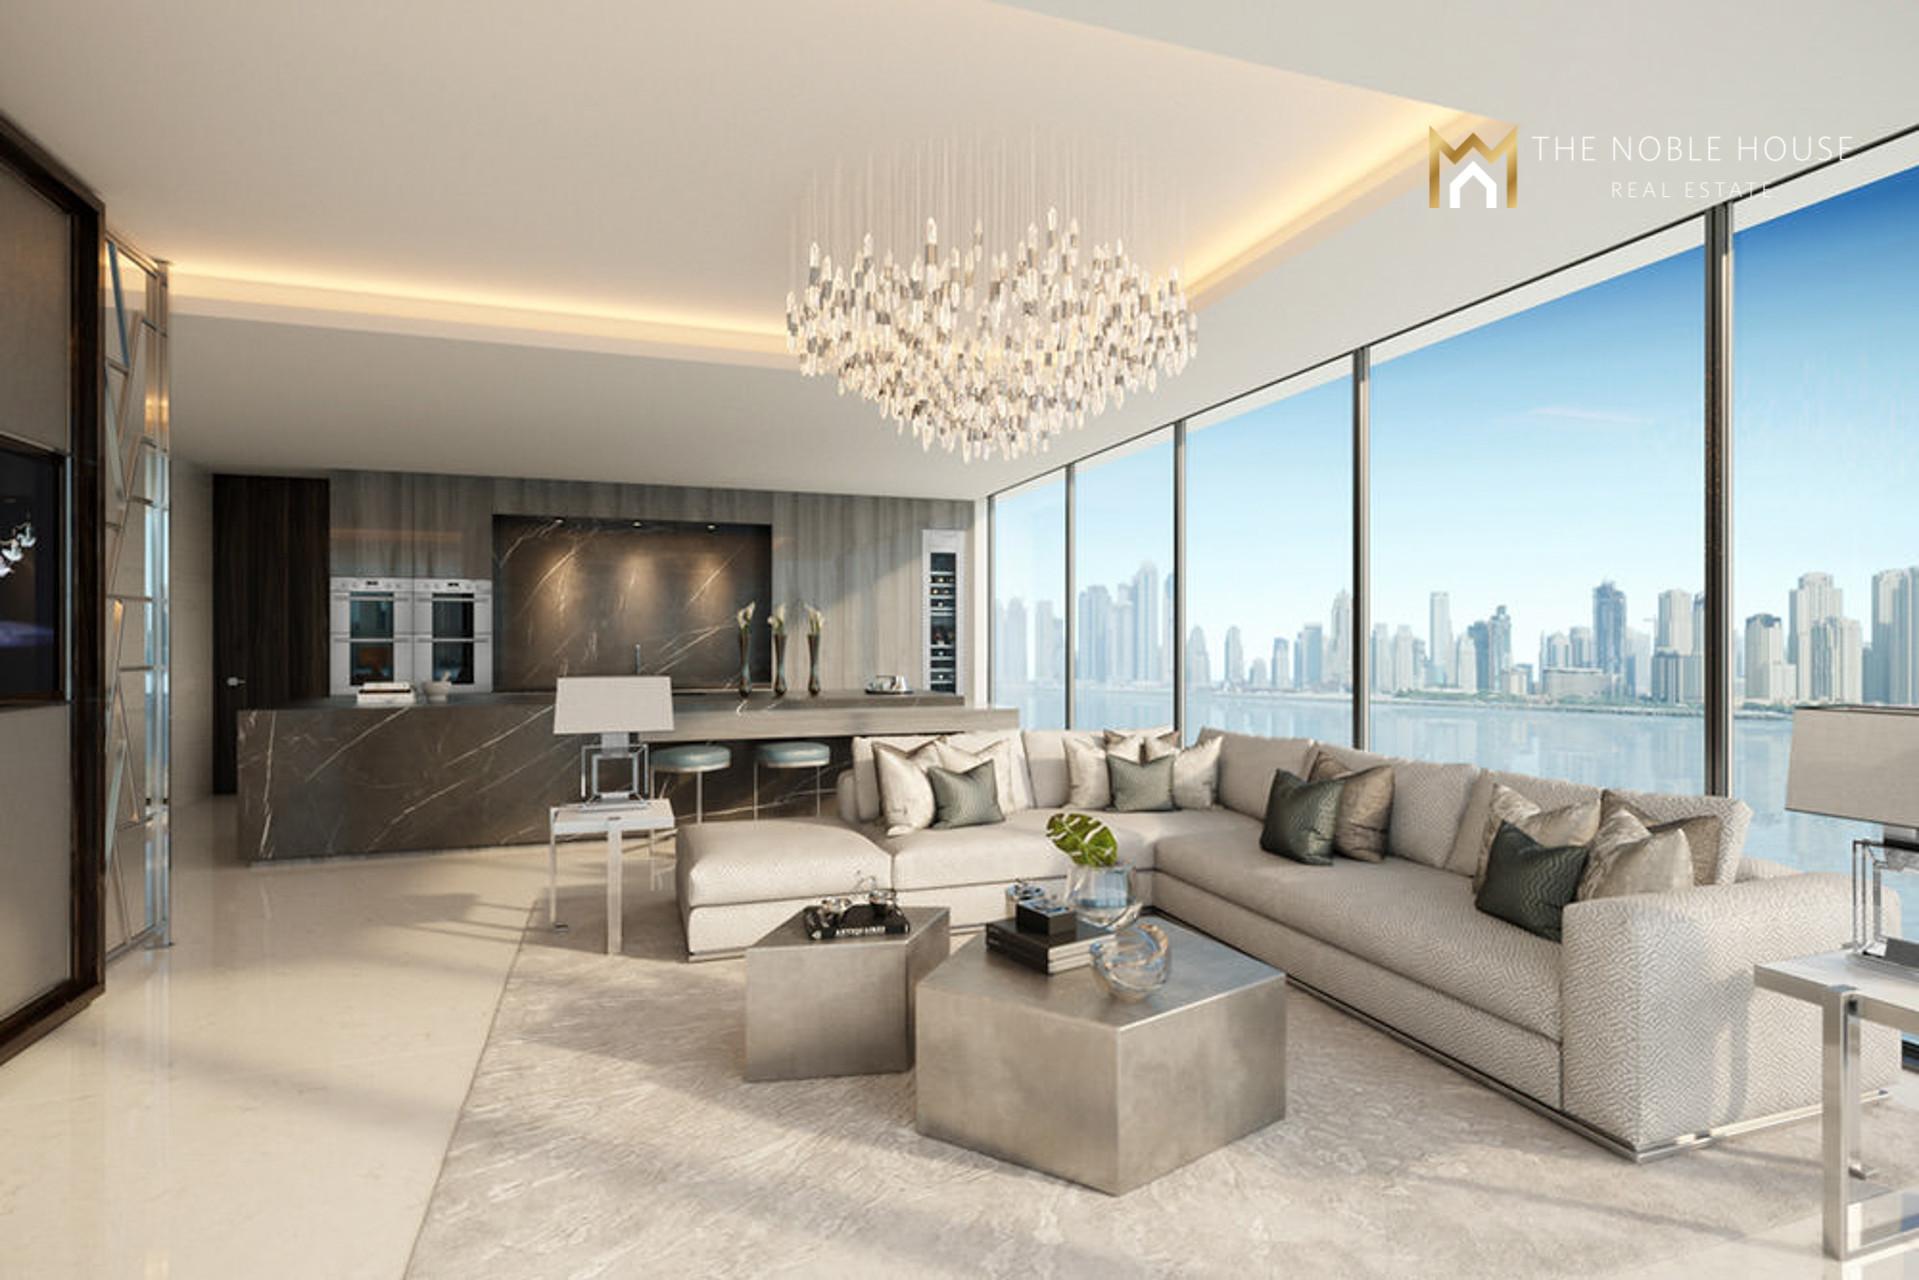 Ihram Kids For Sale Dubai: 5 Bed Duplex Penthouse Limited Collection